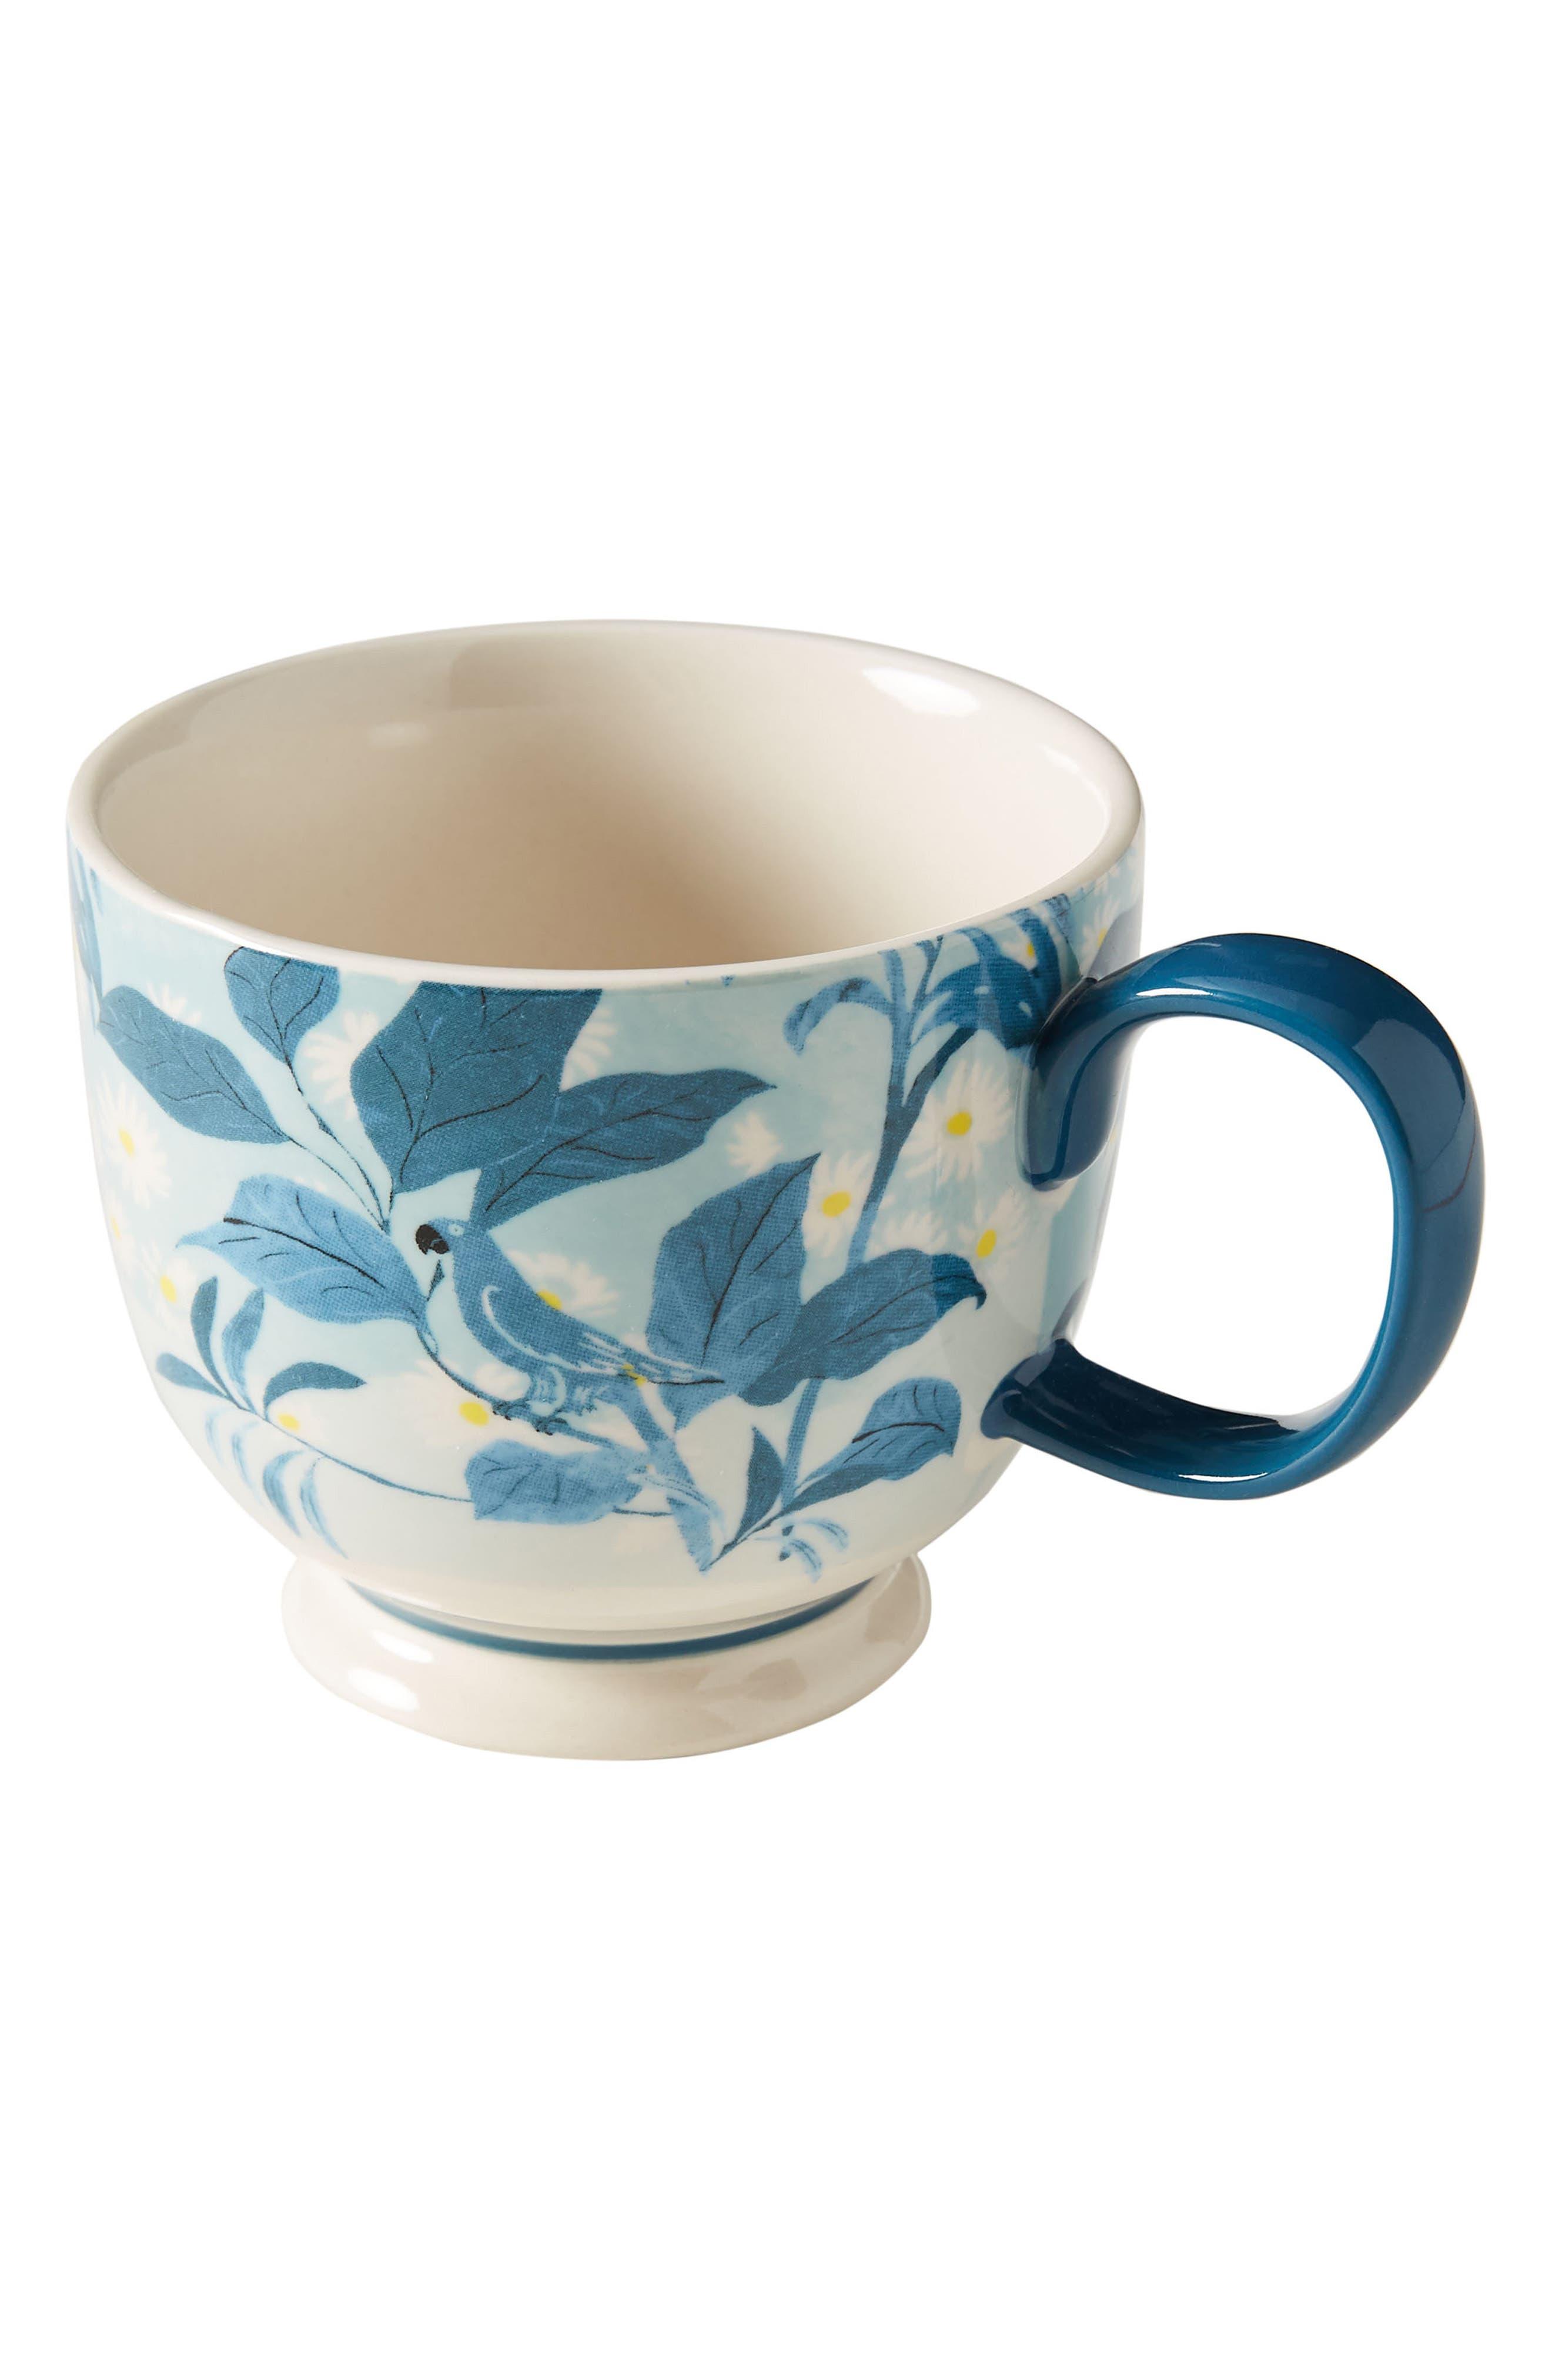 ANTHROPOLOGIE, Paule Marrot Set of 4 Mugs, Alternate thumbnail 3, color, COMBO C-BLUE